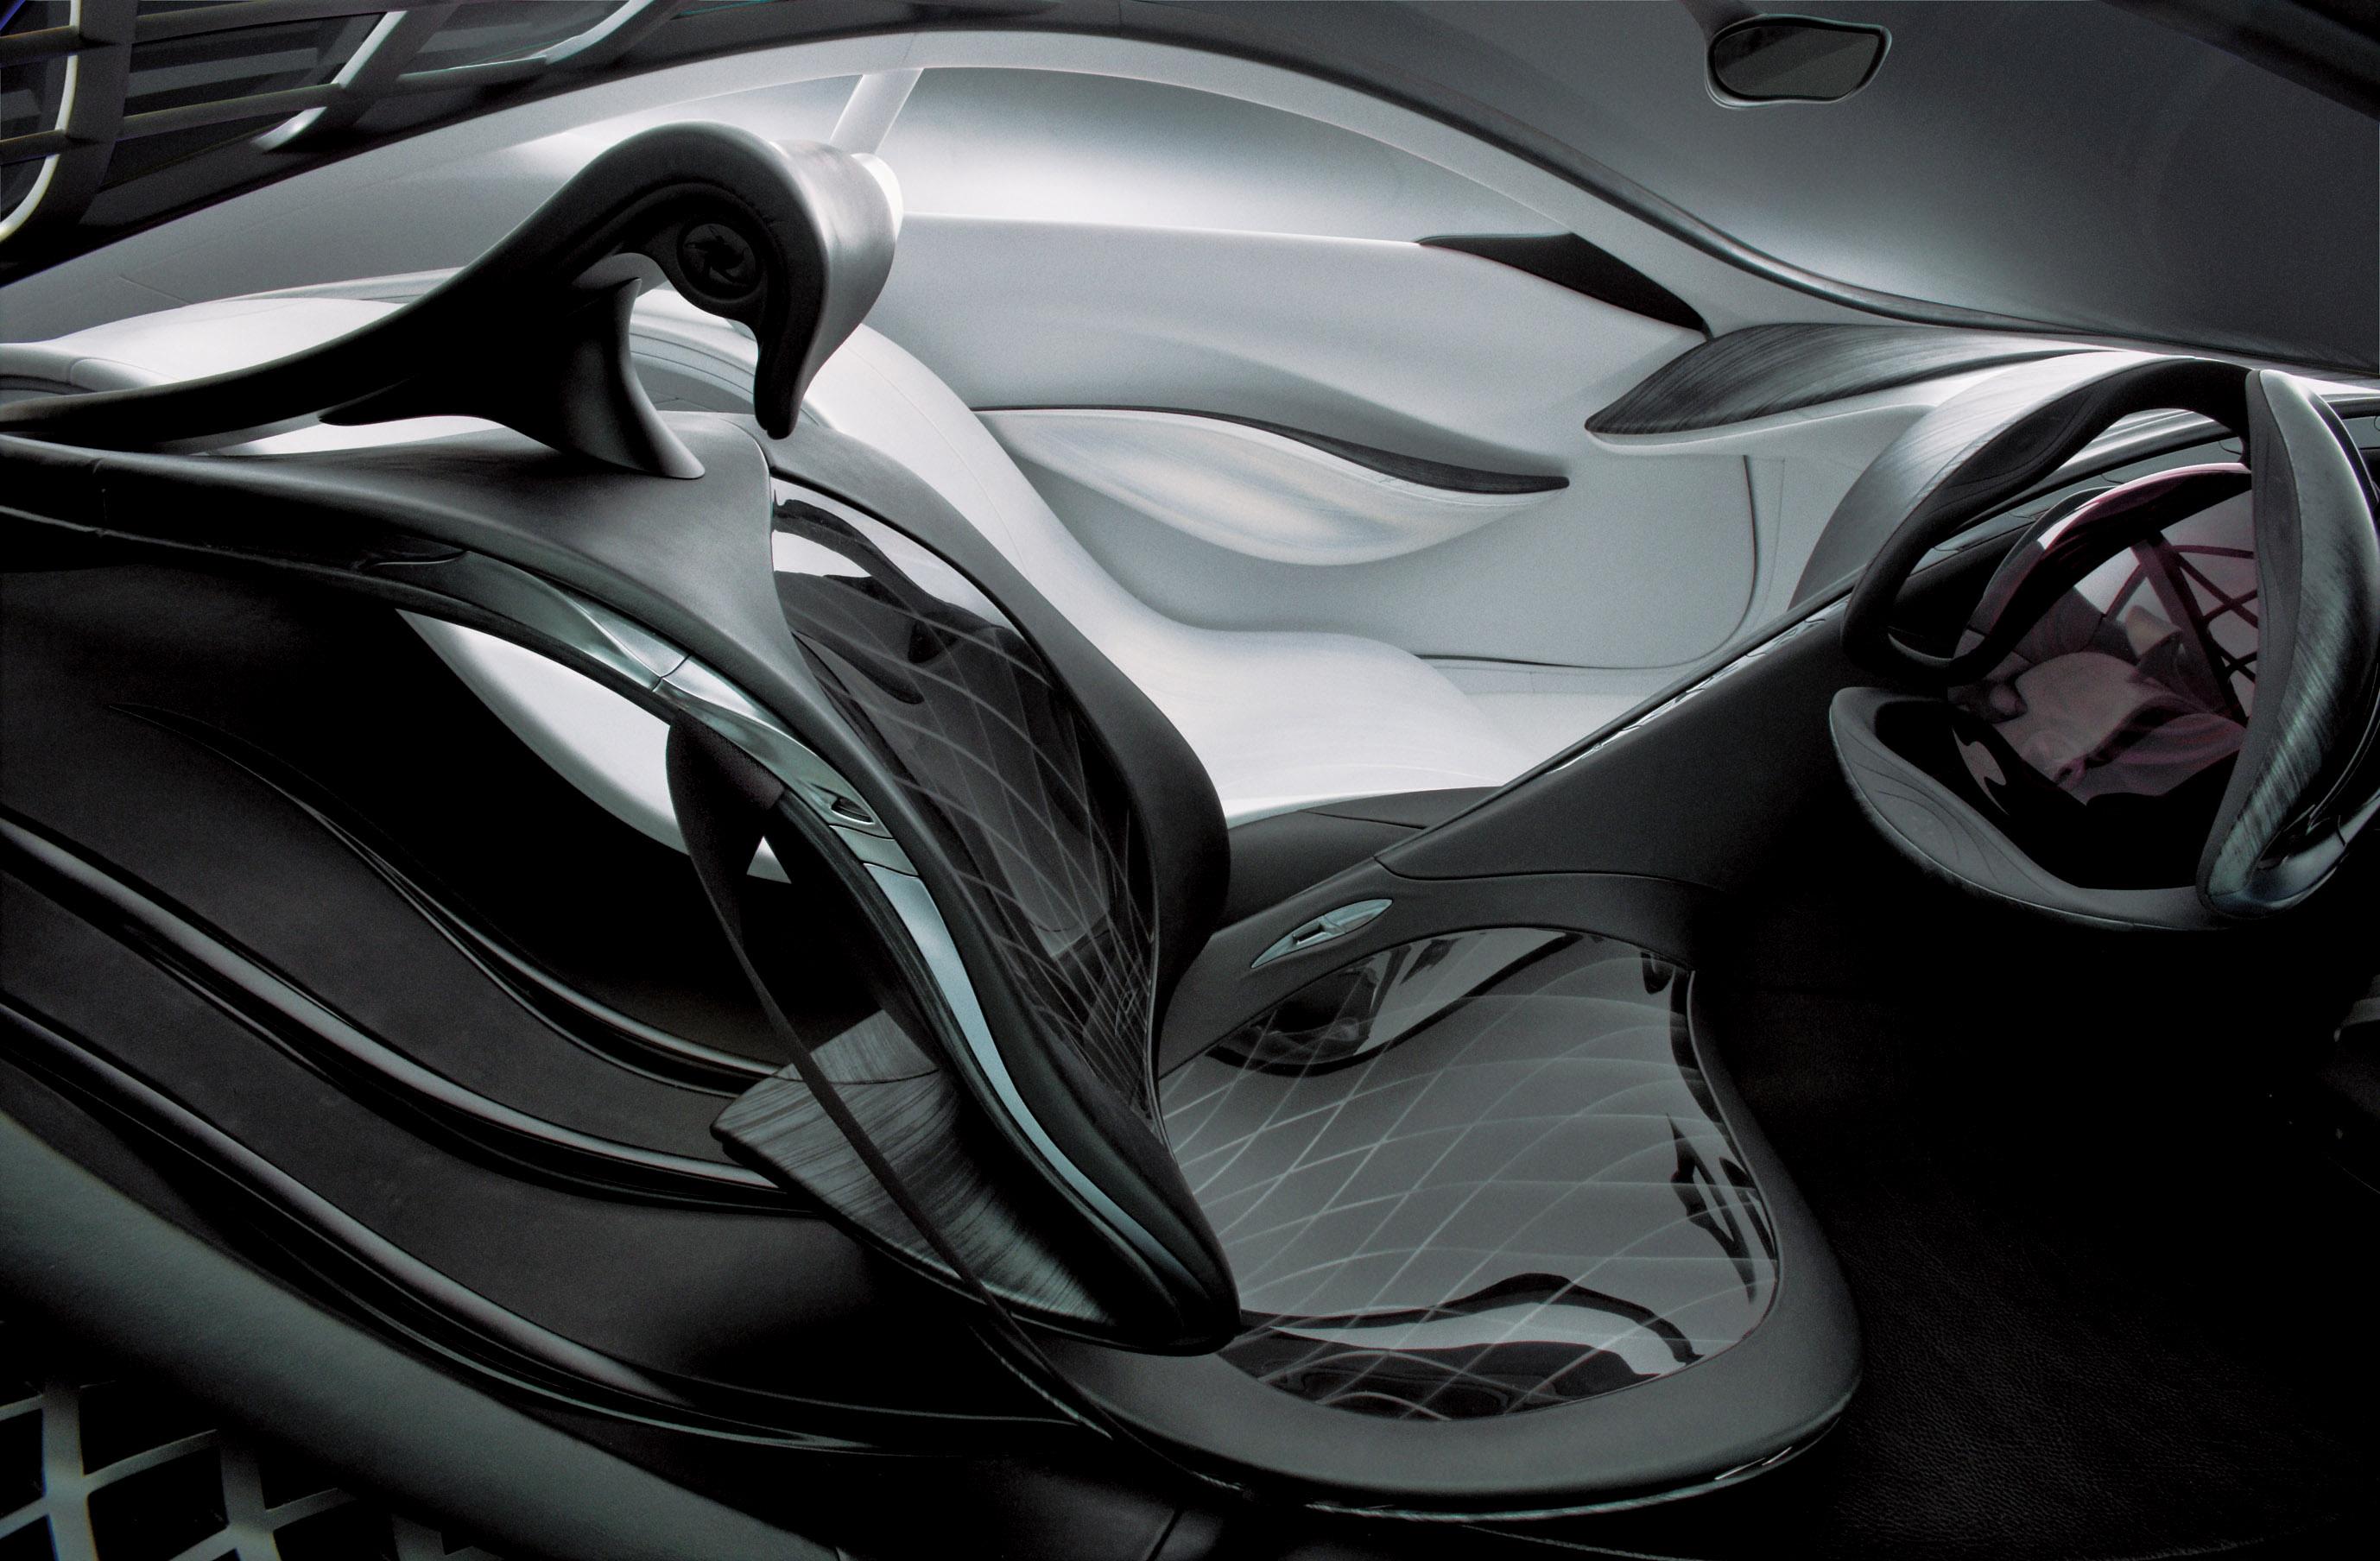 https://www.automobilesreview.com/gallery/mazda-taiki-concept/mazda-taiki-concept-13.jpg